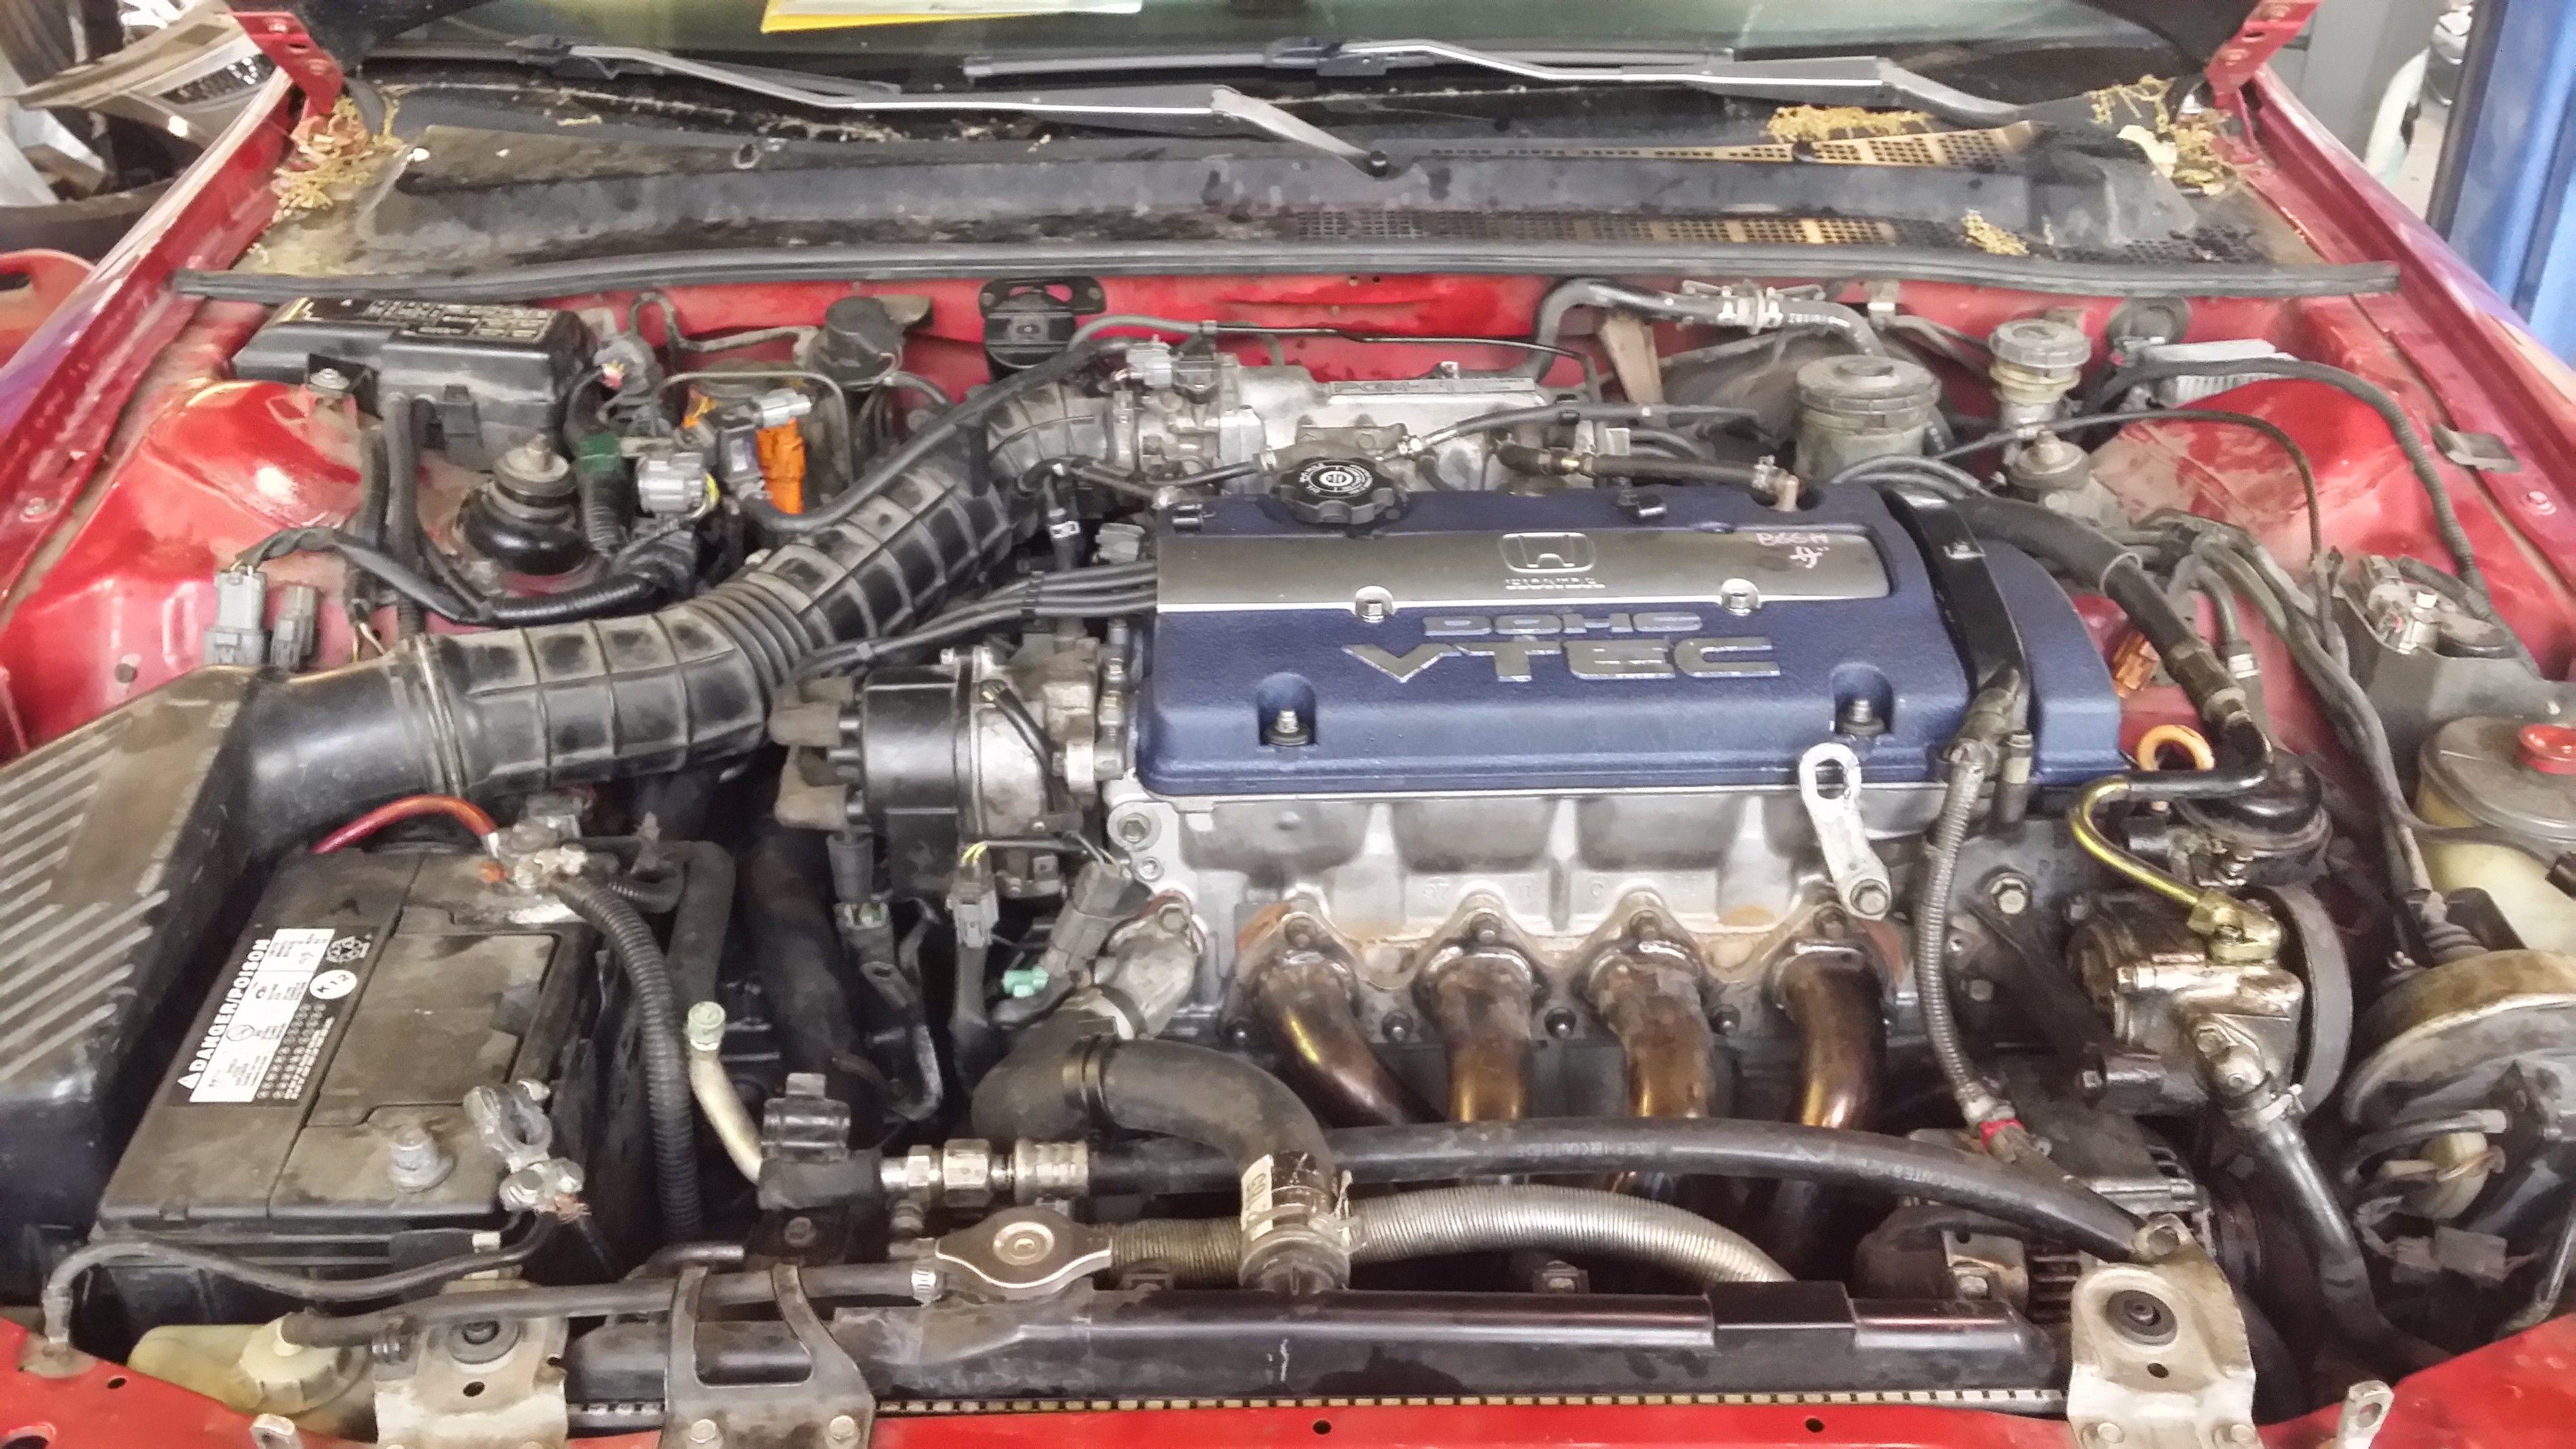 H23 Honda Prelude Ecu Wiring Harness Diagram